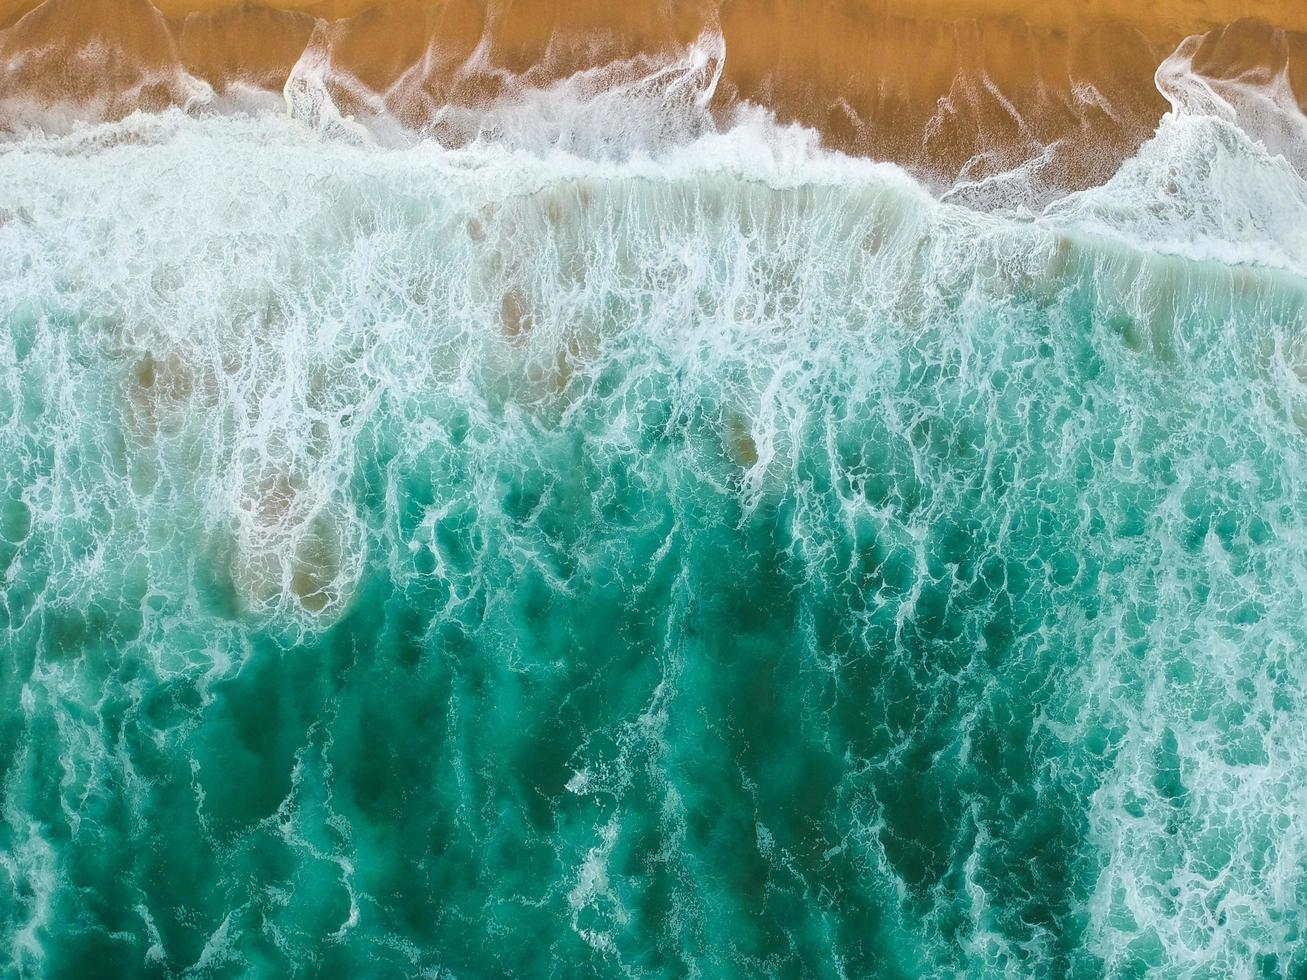 Waves crash shore photo